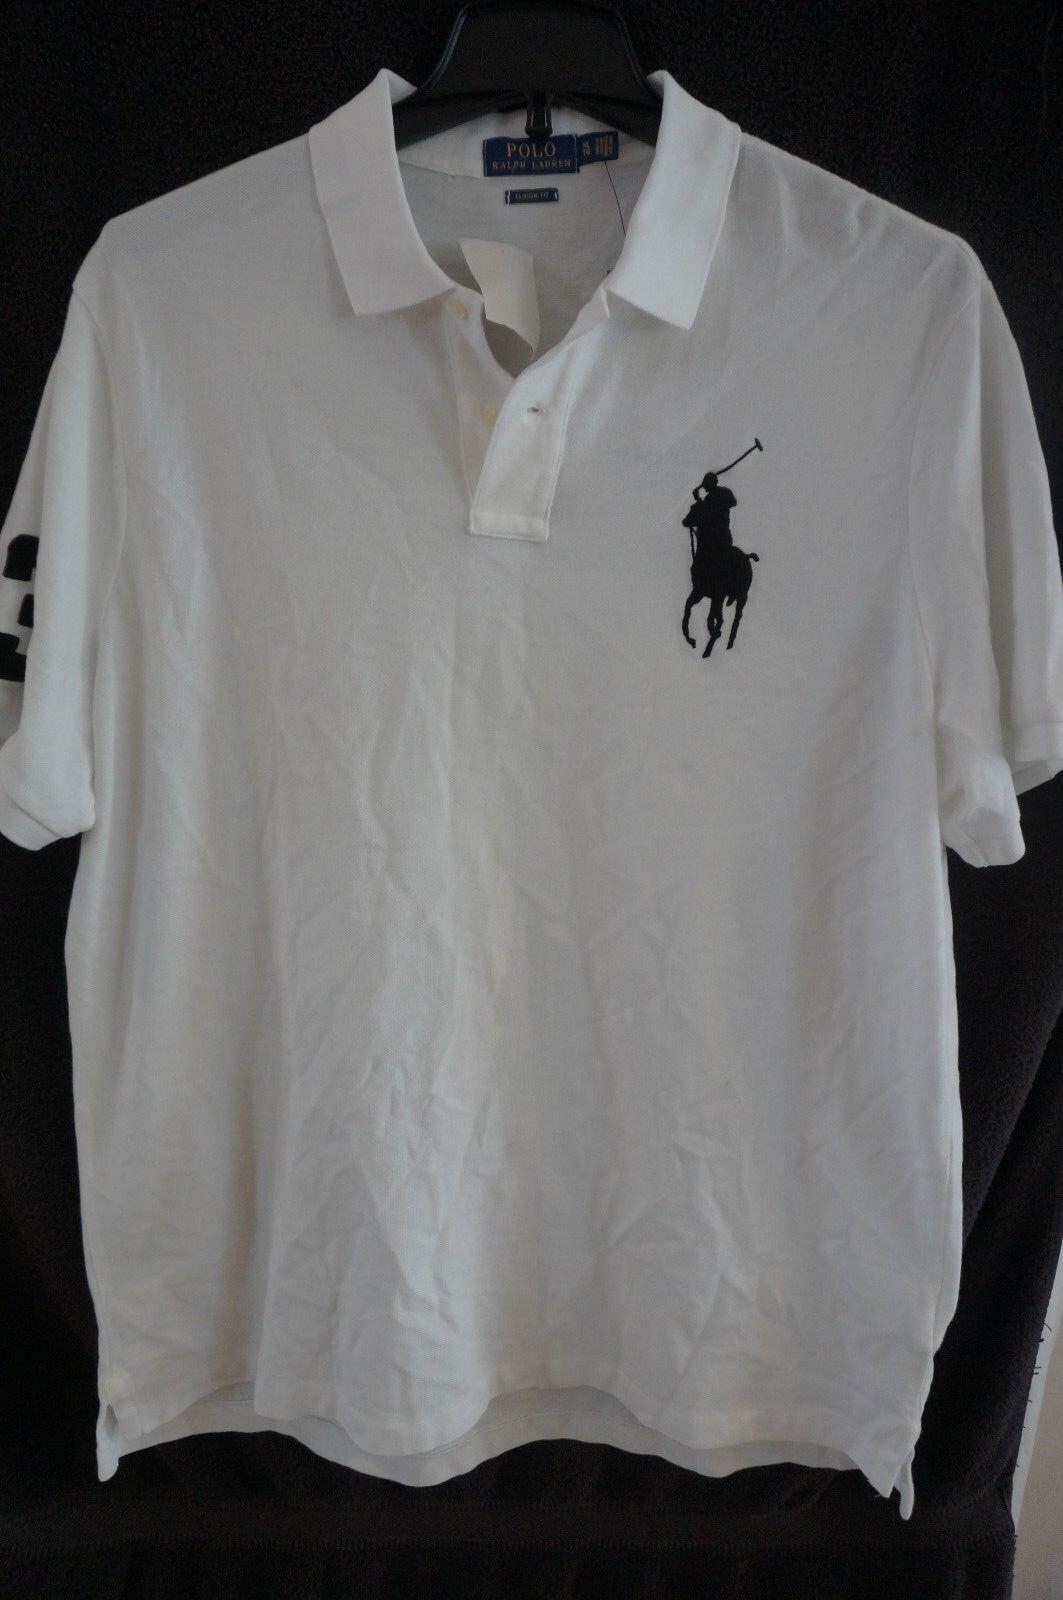 POLO RALPH LAUREN Men's White Polo Shirt Classic Fit Mesh Big Pony XL NWT